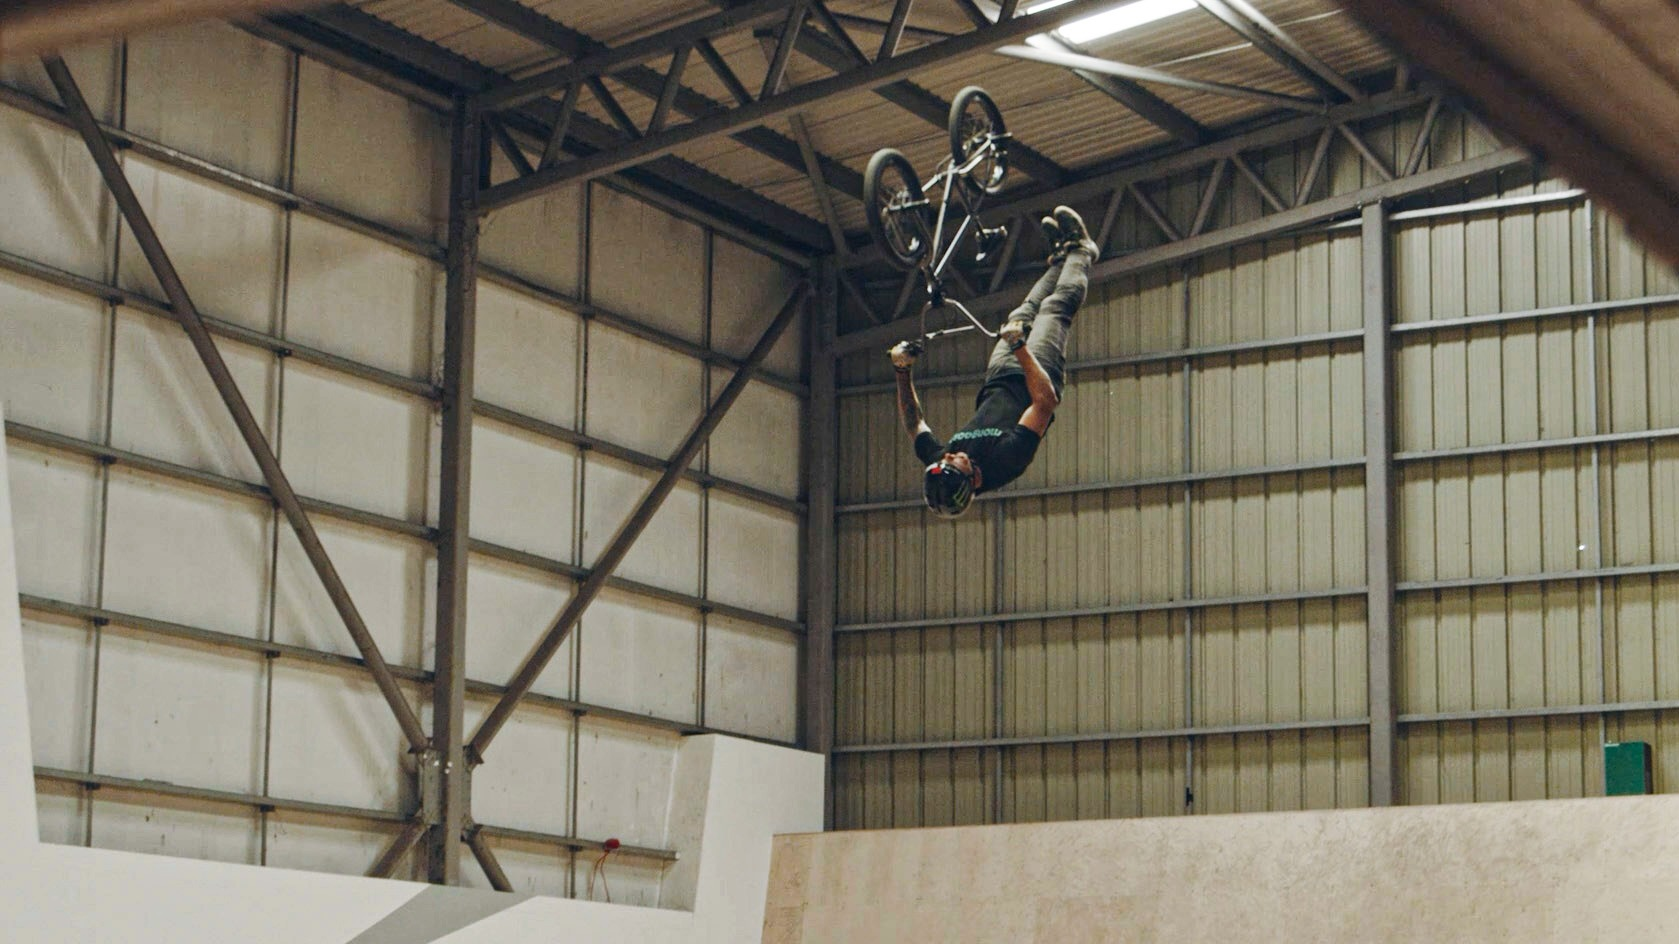 E-FISE 2020: UK Rider Video Highlights